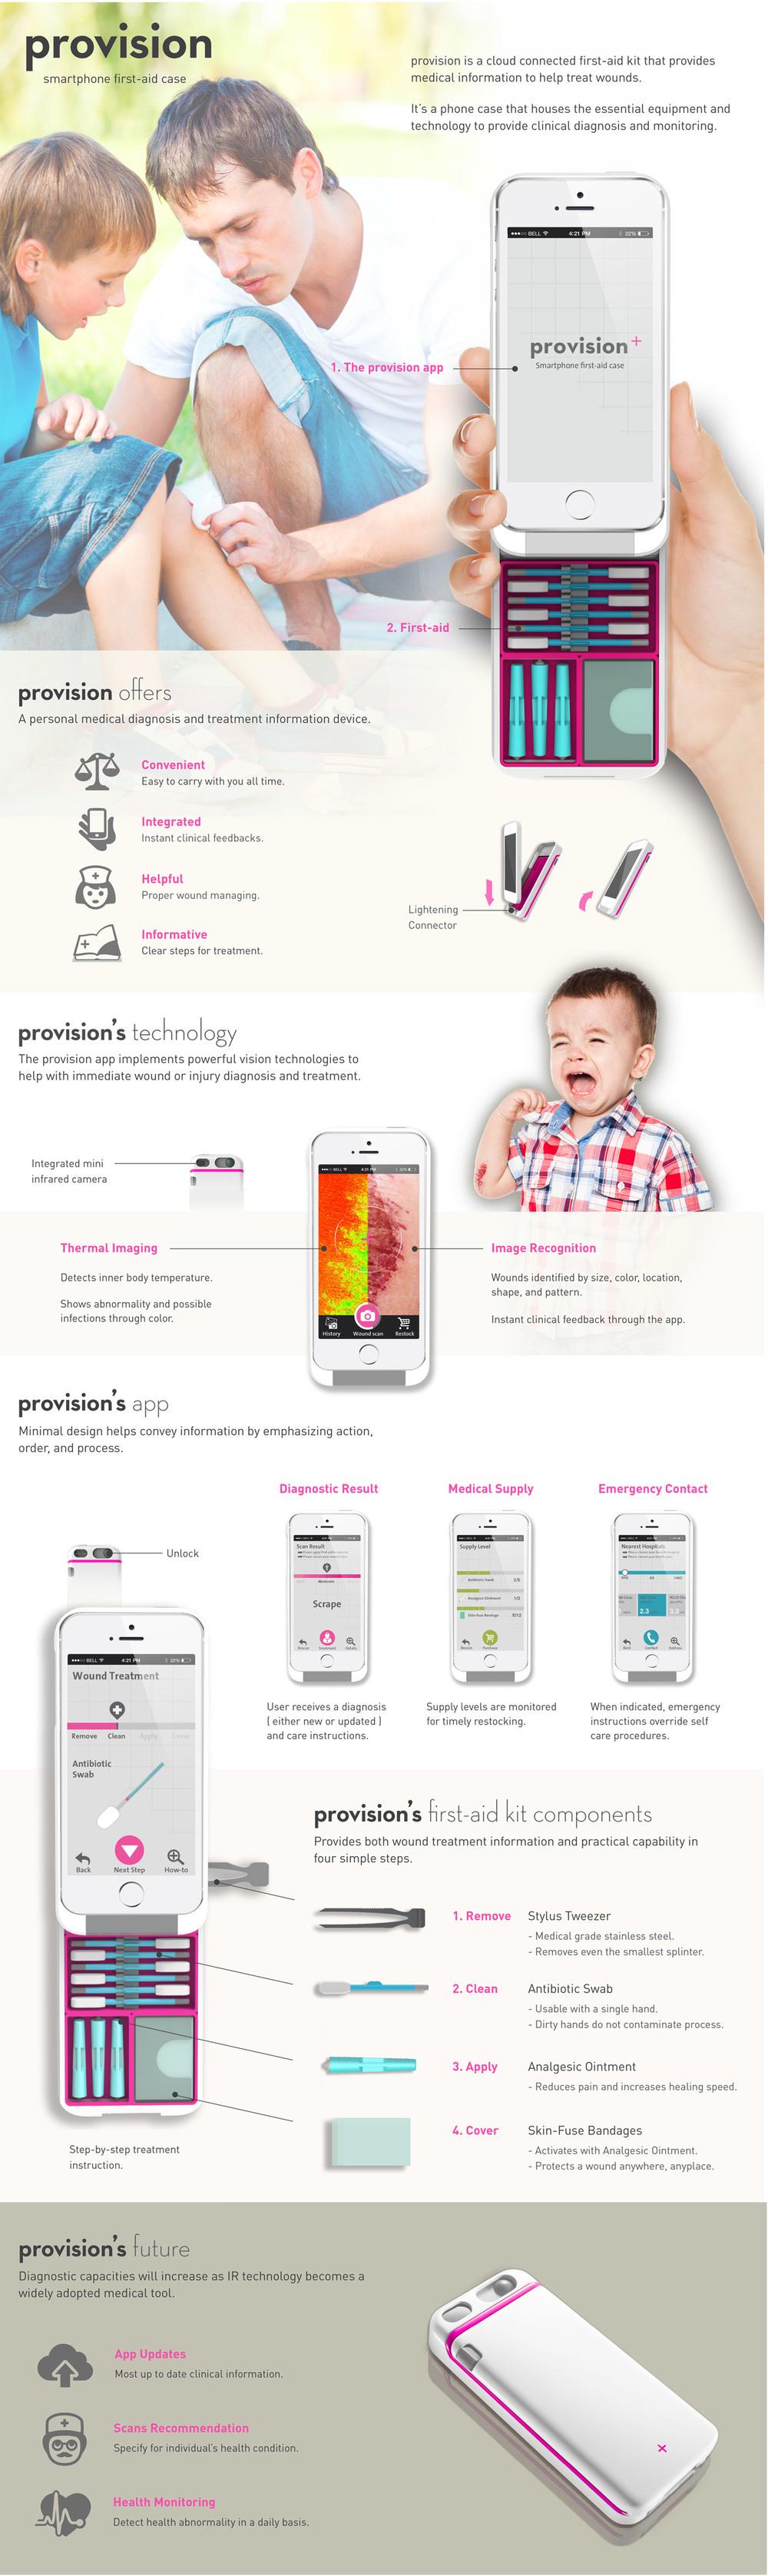 provision-page.jpg